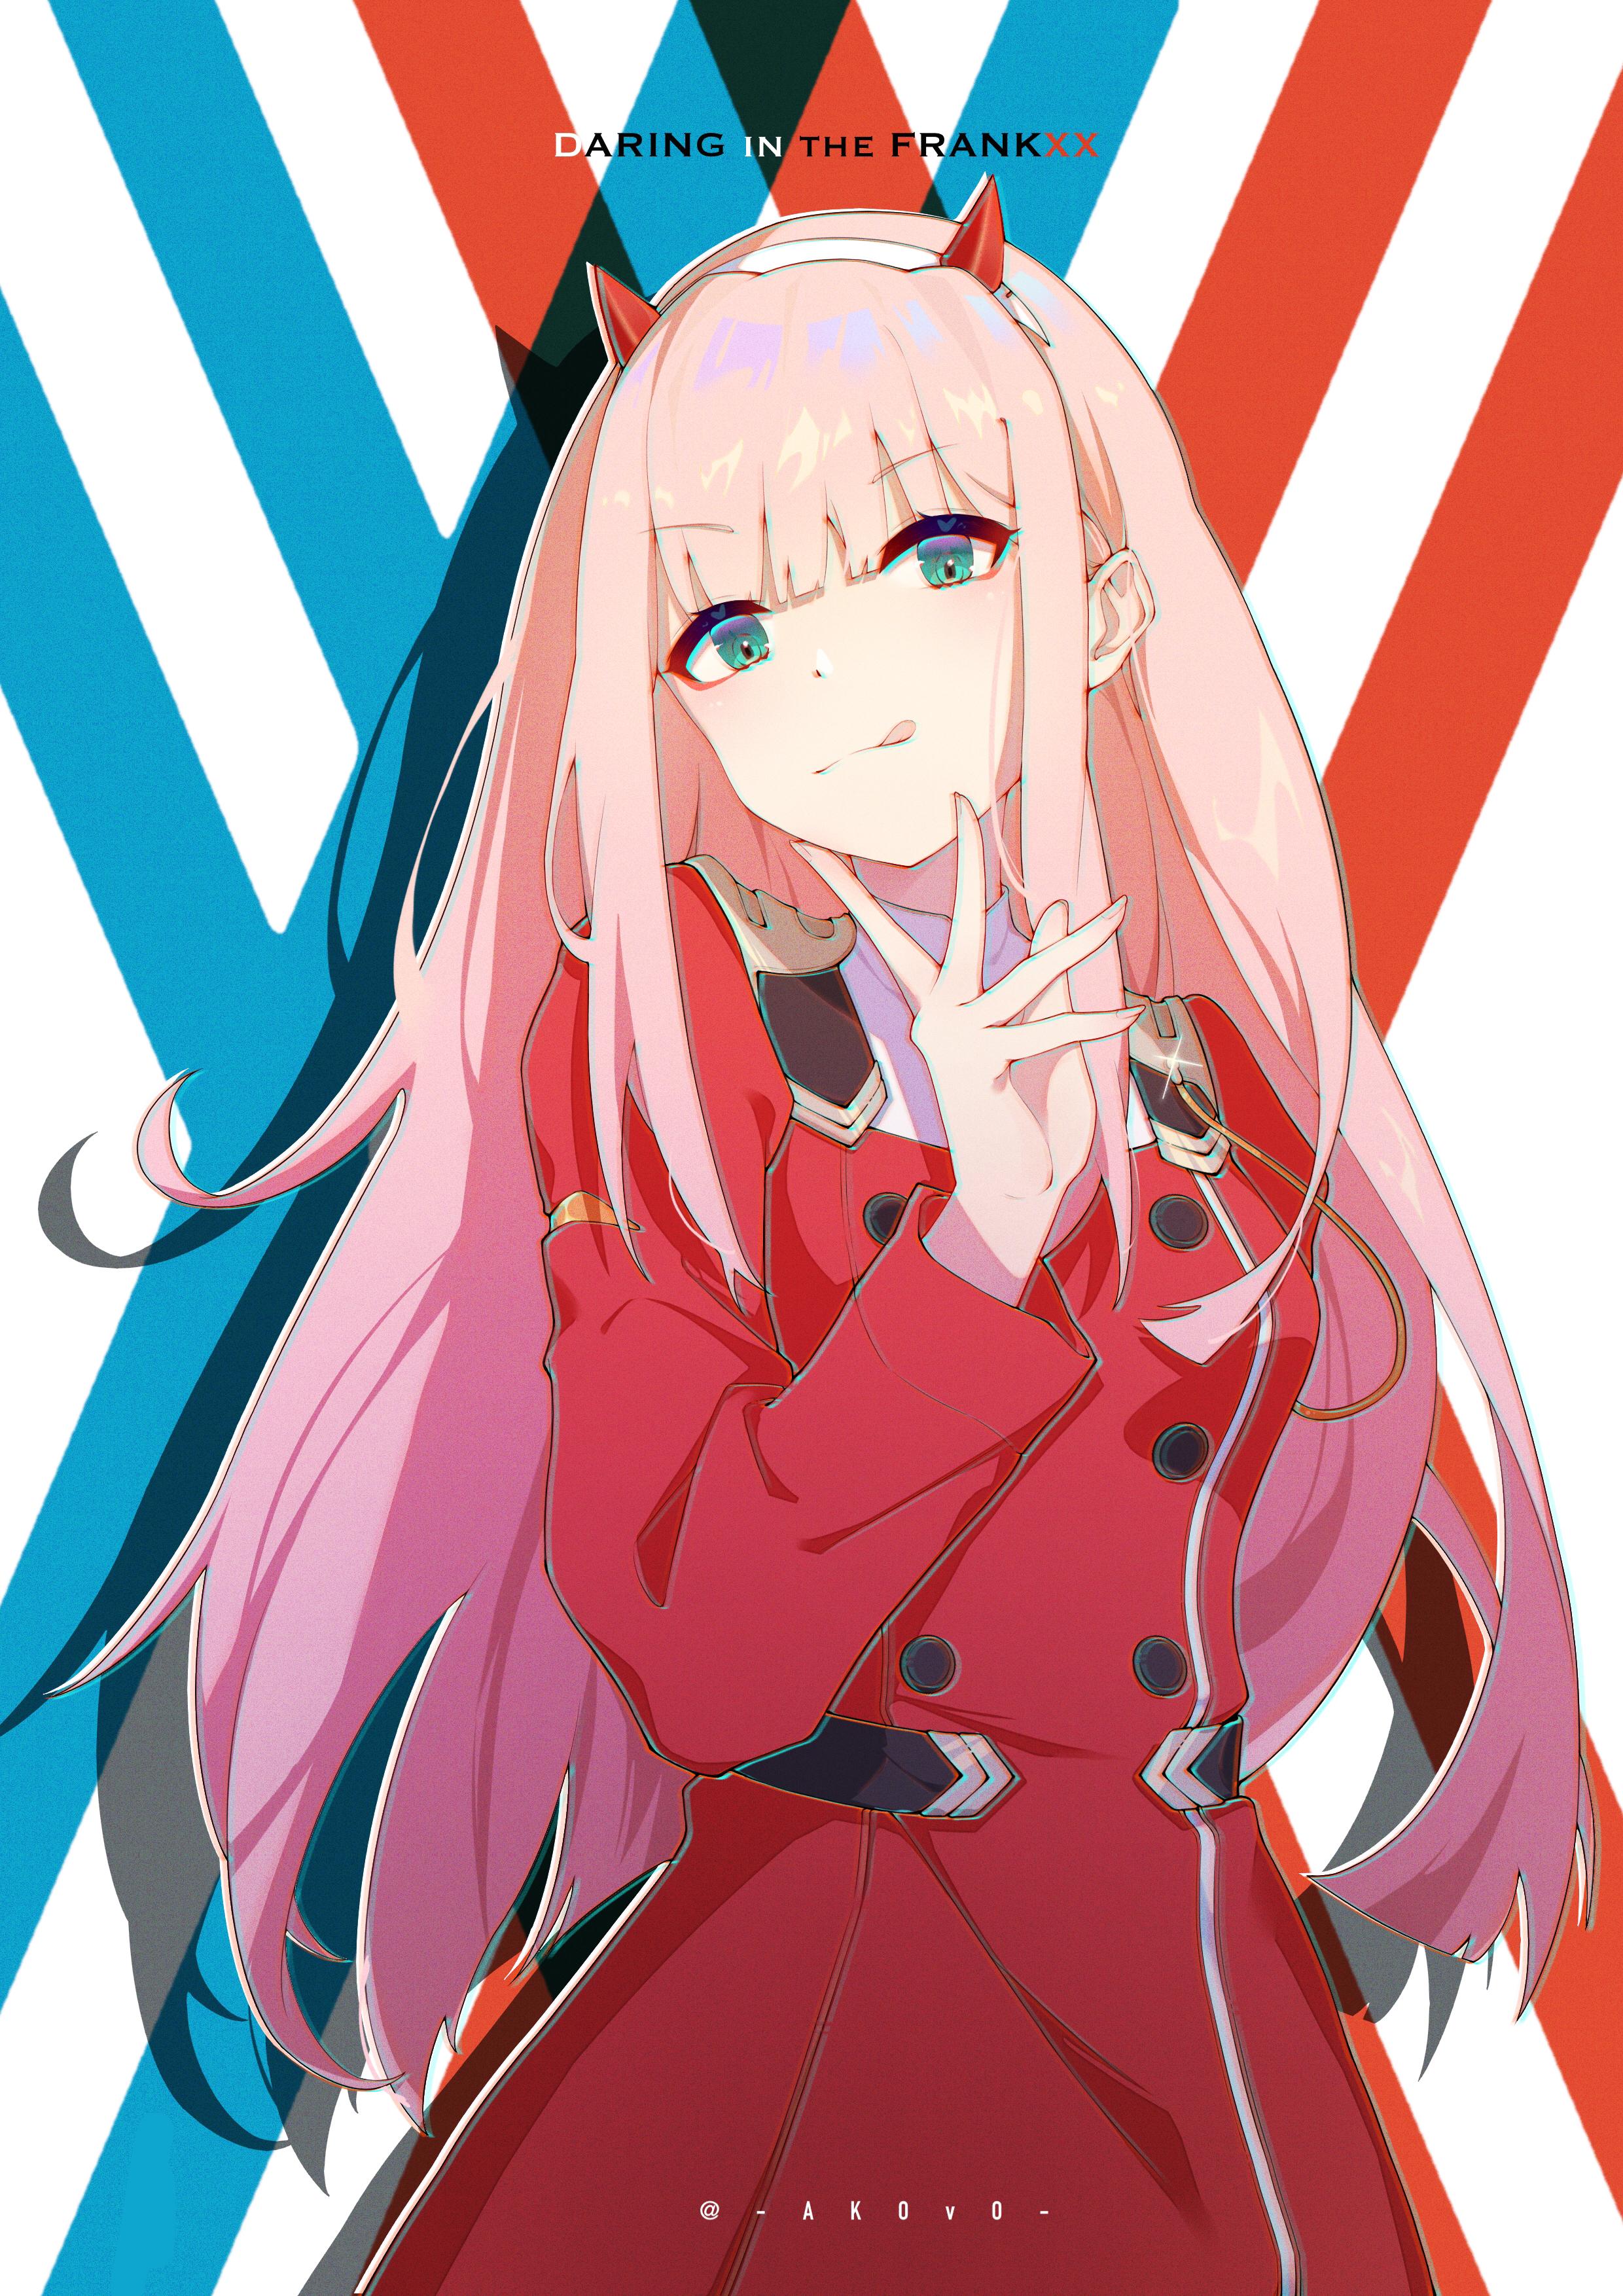 Zero Two Darling In The Franxx Mobile Wallpaper 3042612 Zerochan Anime Image Board